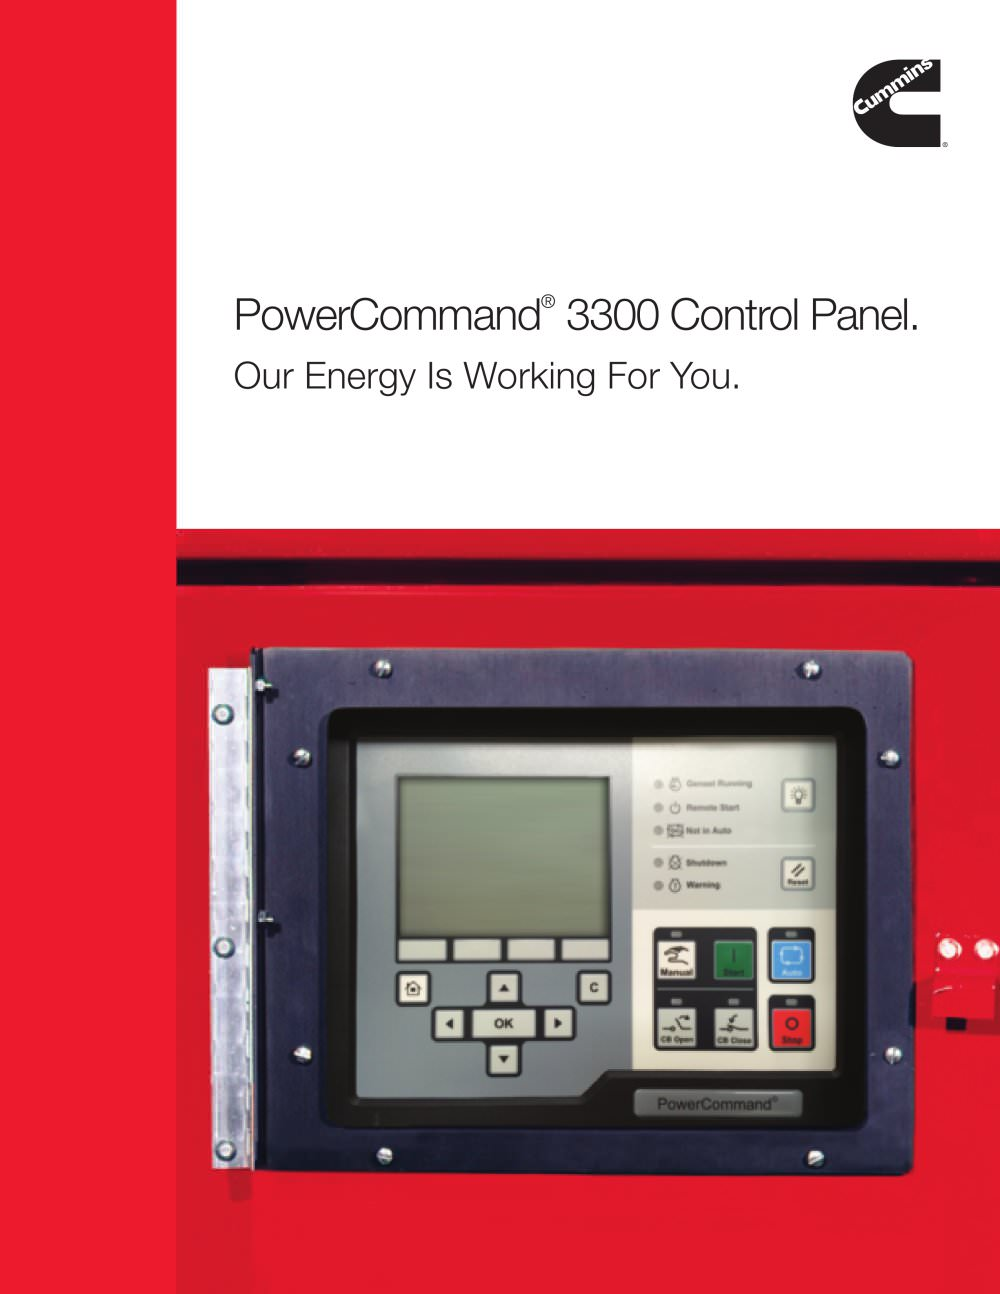 powercommand 3300 control panel brochure cummins inc pdf rh pdf directindustry com 2017 Cummins Manual Cummins Engine Manual